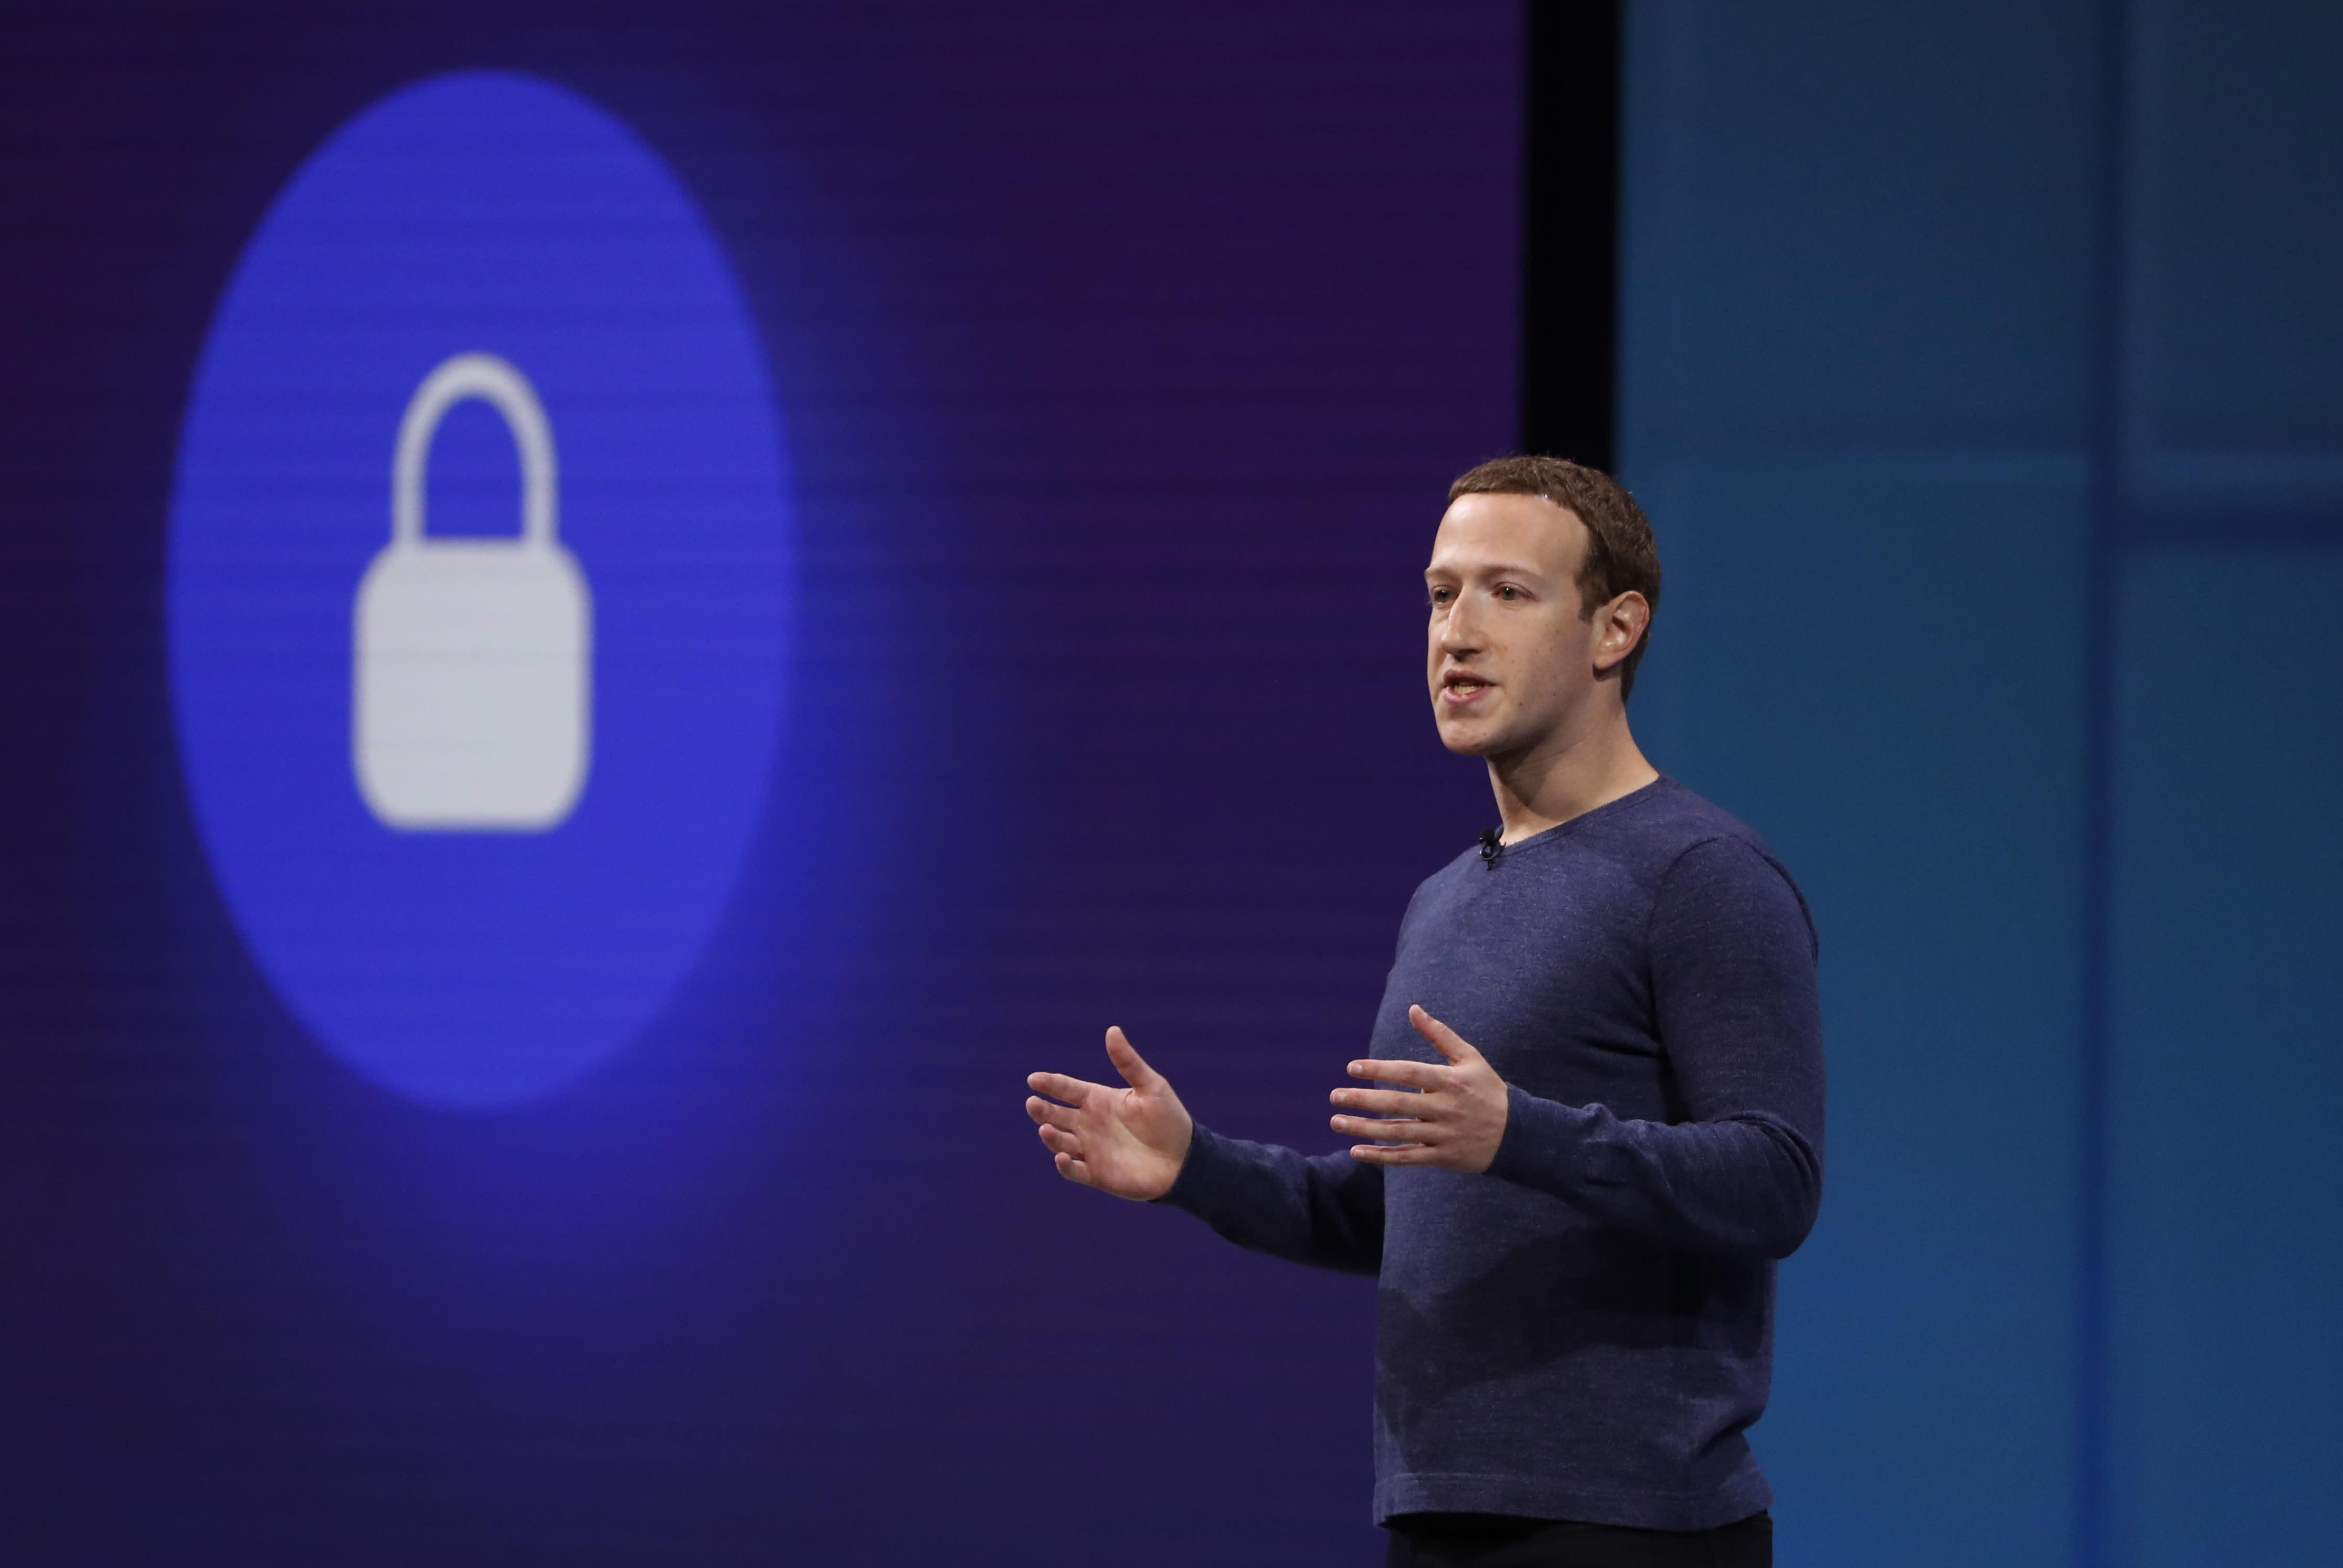 News post image: Facebook stock tumbles despite earnings beat